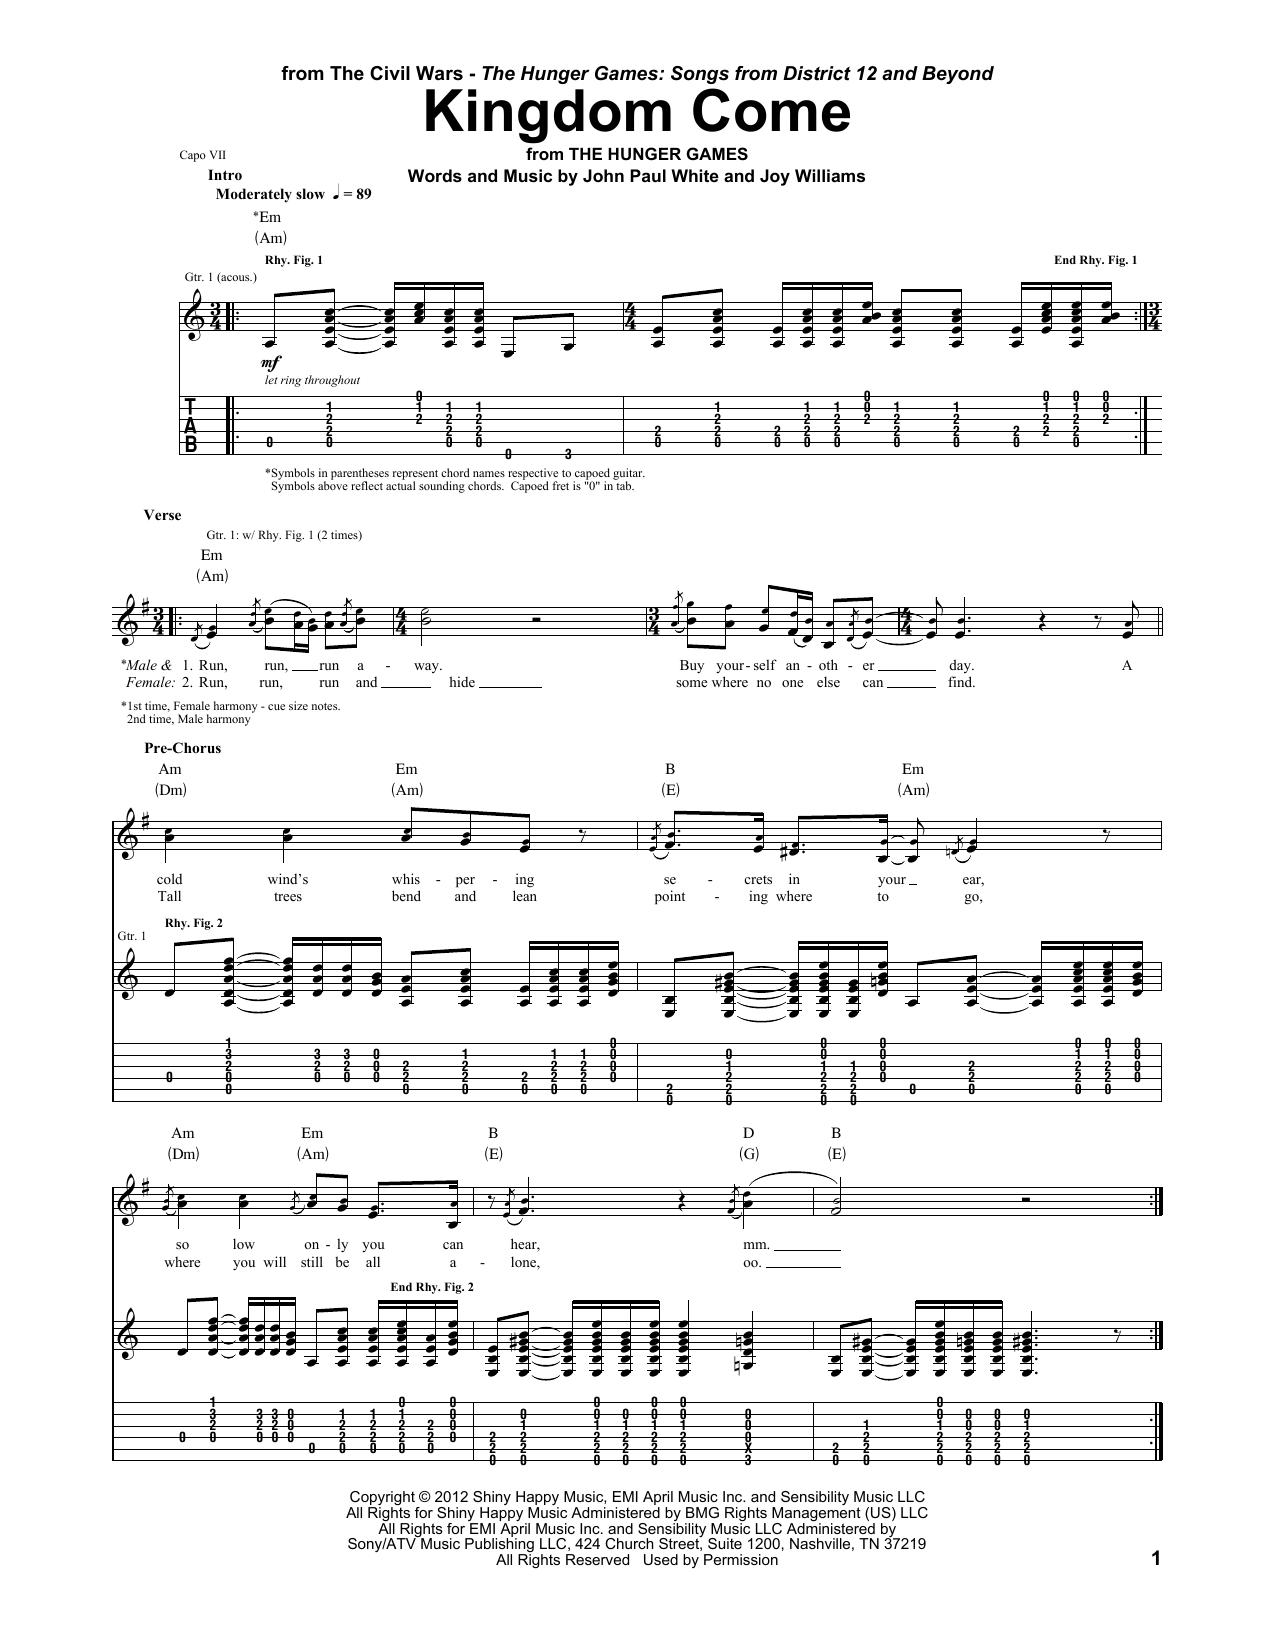 Sheet Music Digital Files To Print Licensed The Civil Wars Digital